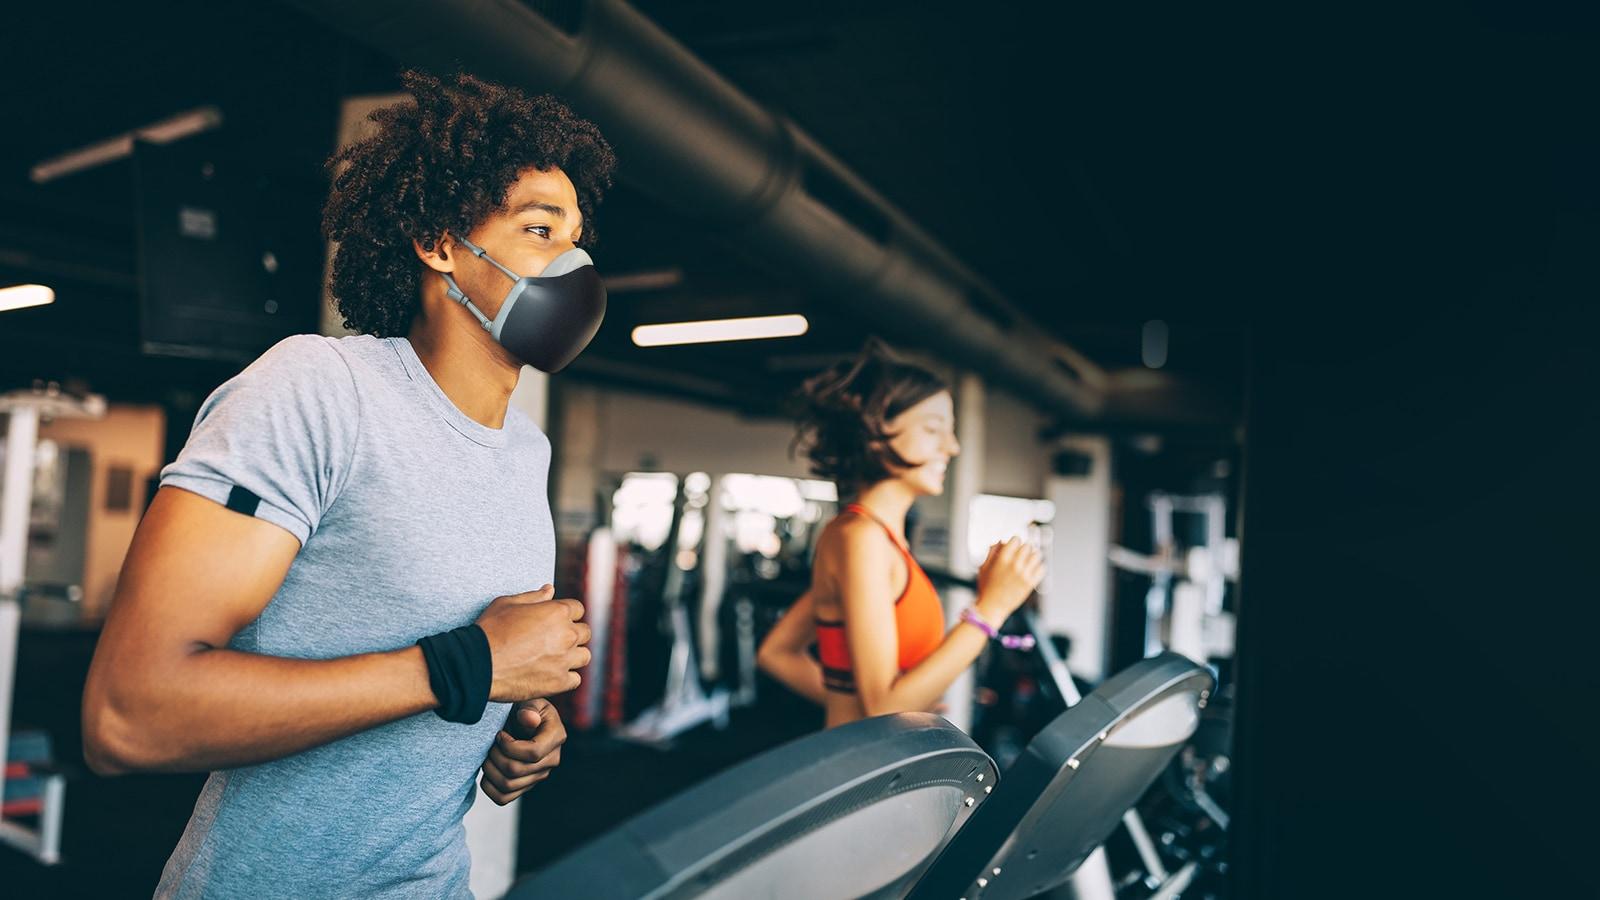 Seorang pria African American sedang berlari pada sebuah treadmill dalam sebuah gym dengan LG PuriCare Wearable Air Purifier warna hitam sedang menyala. Ia tampak bernapas tanpa harus bersusah payah